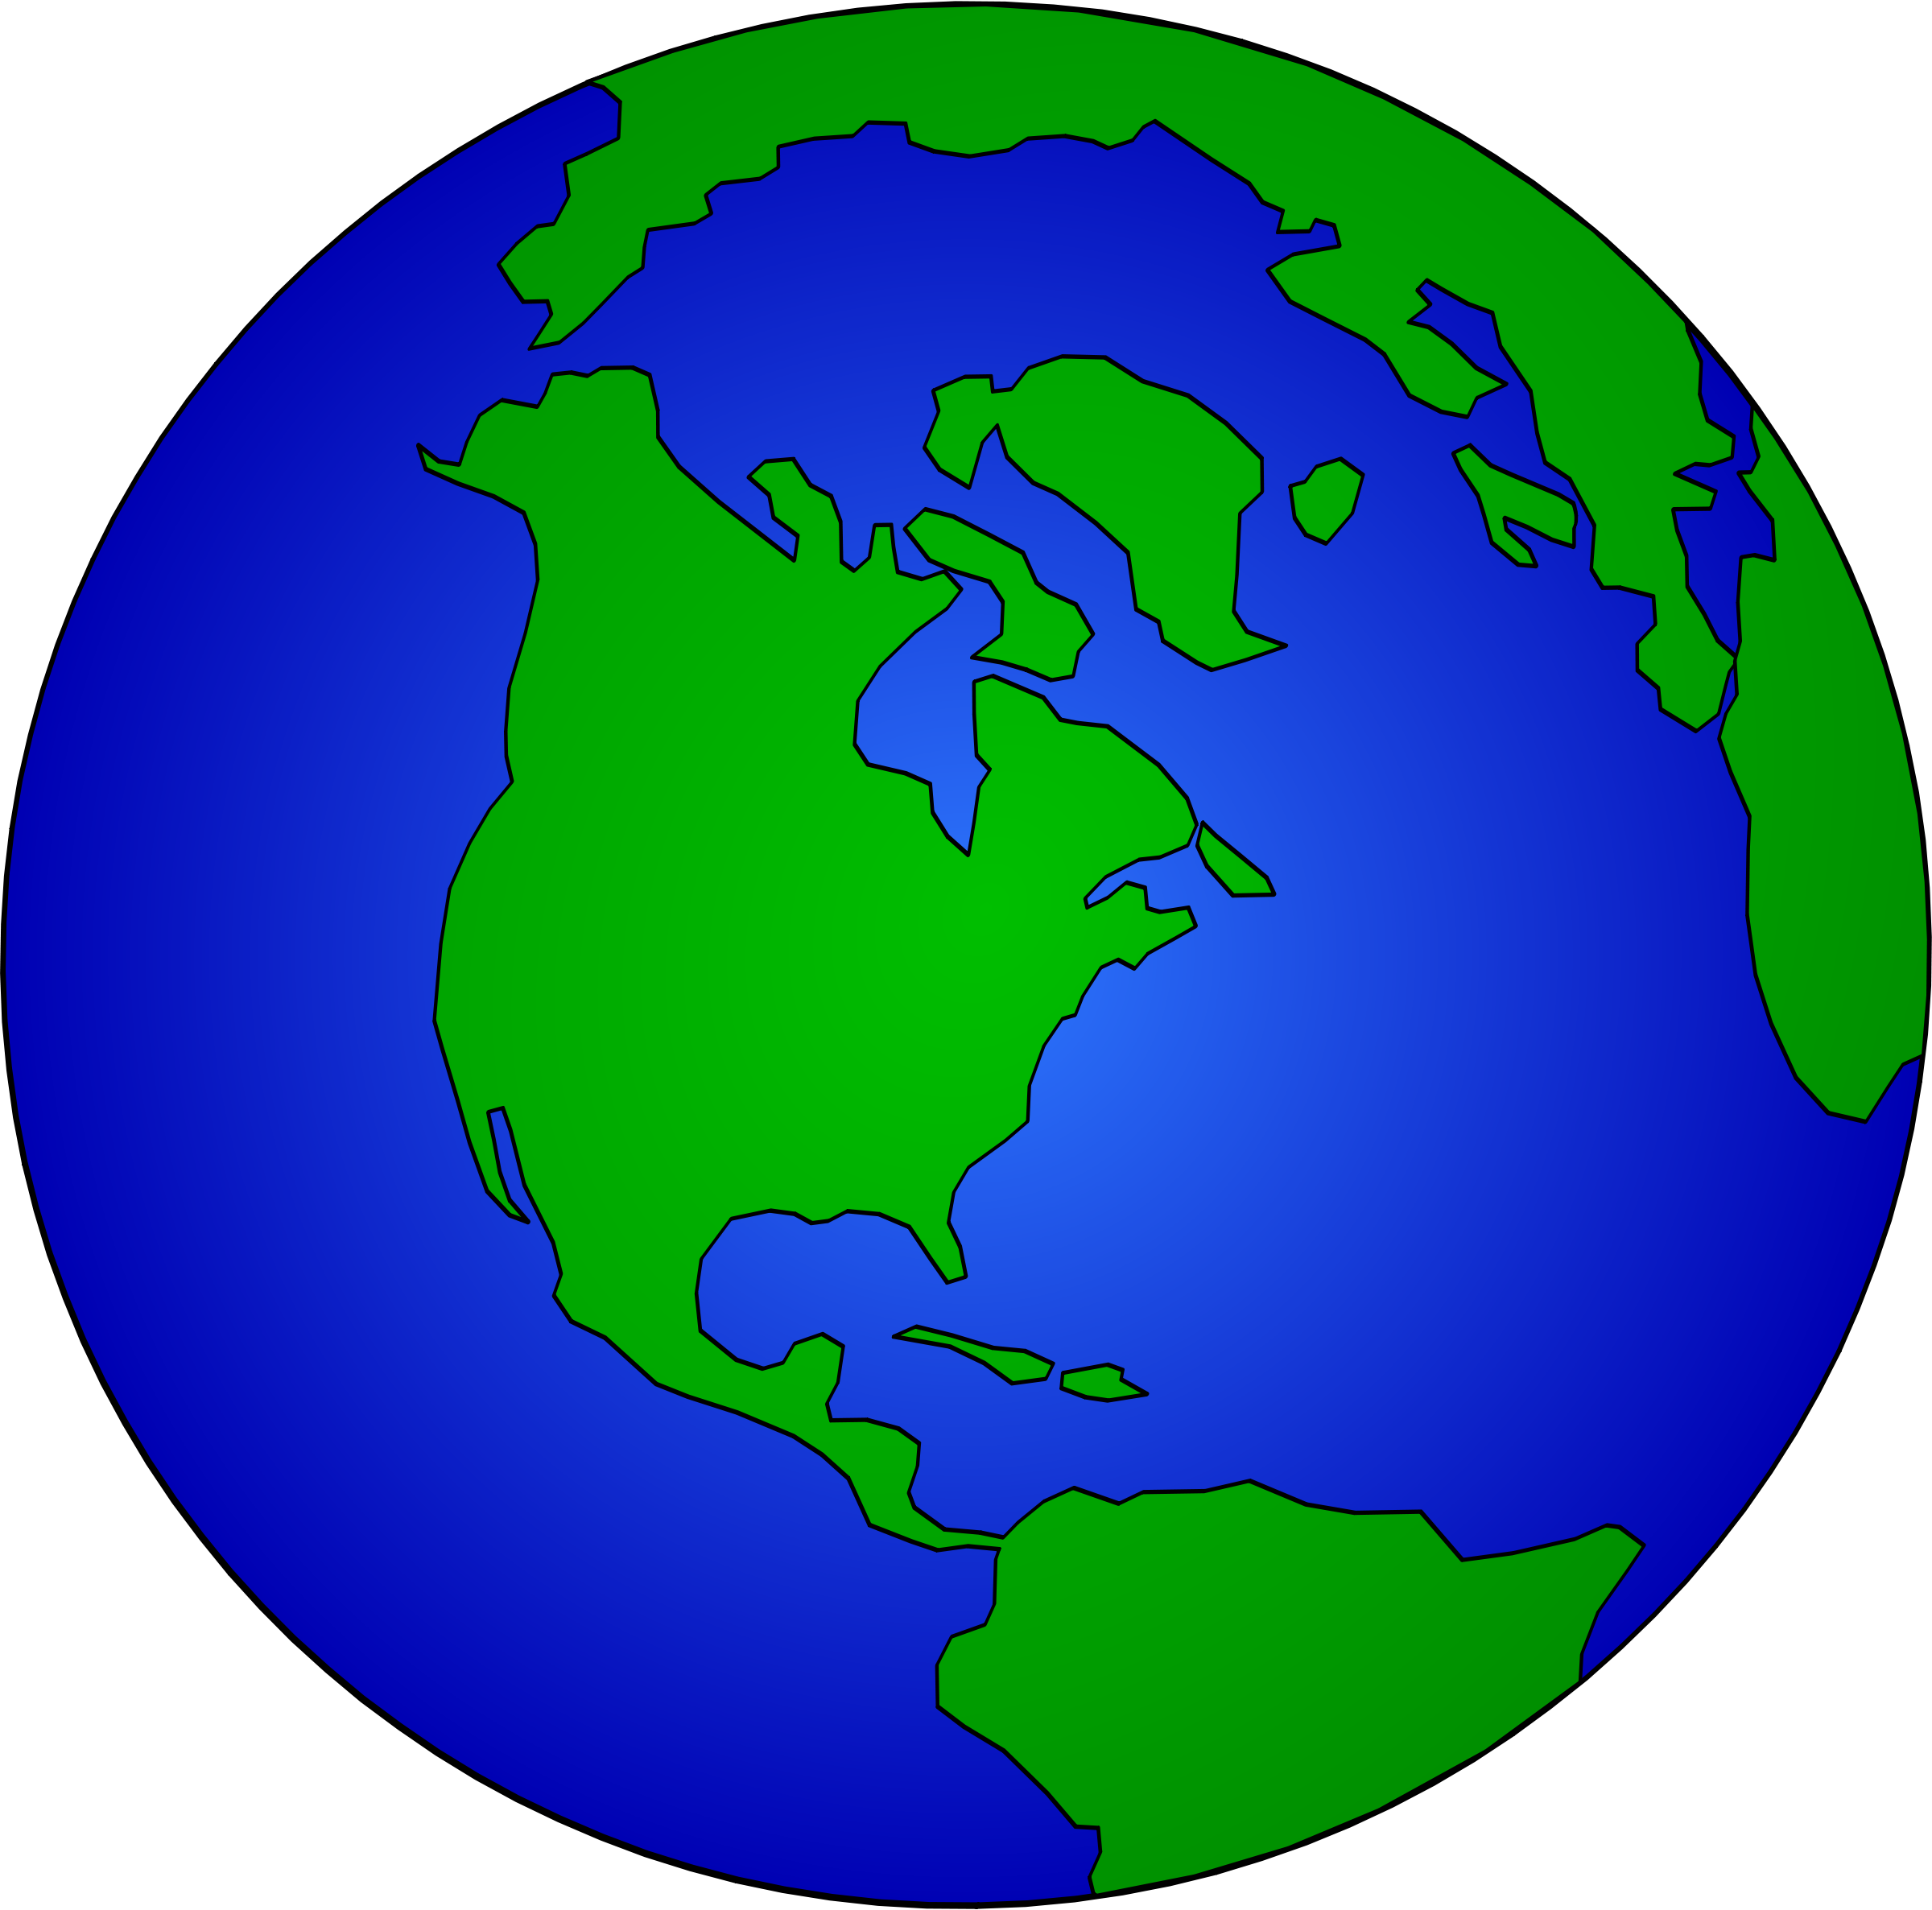 World Image Clip Art-World Image Clip Art-15